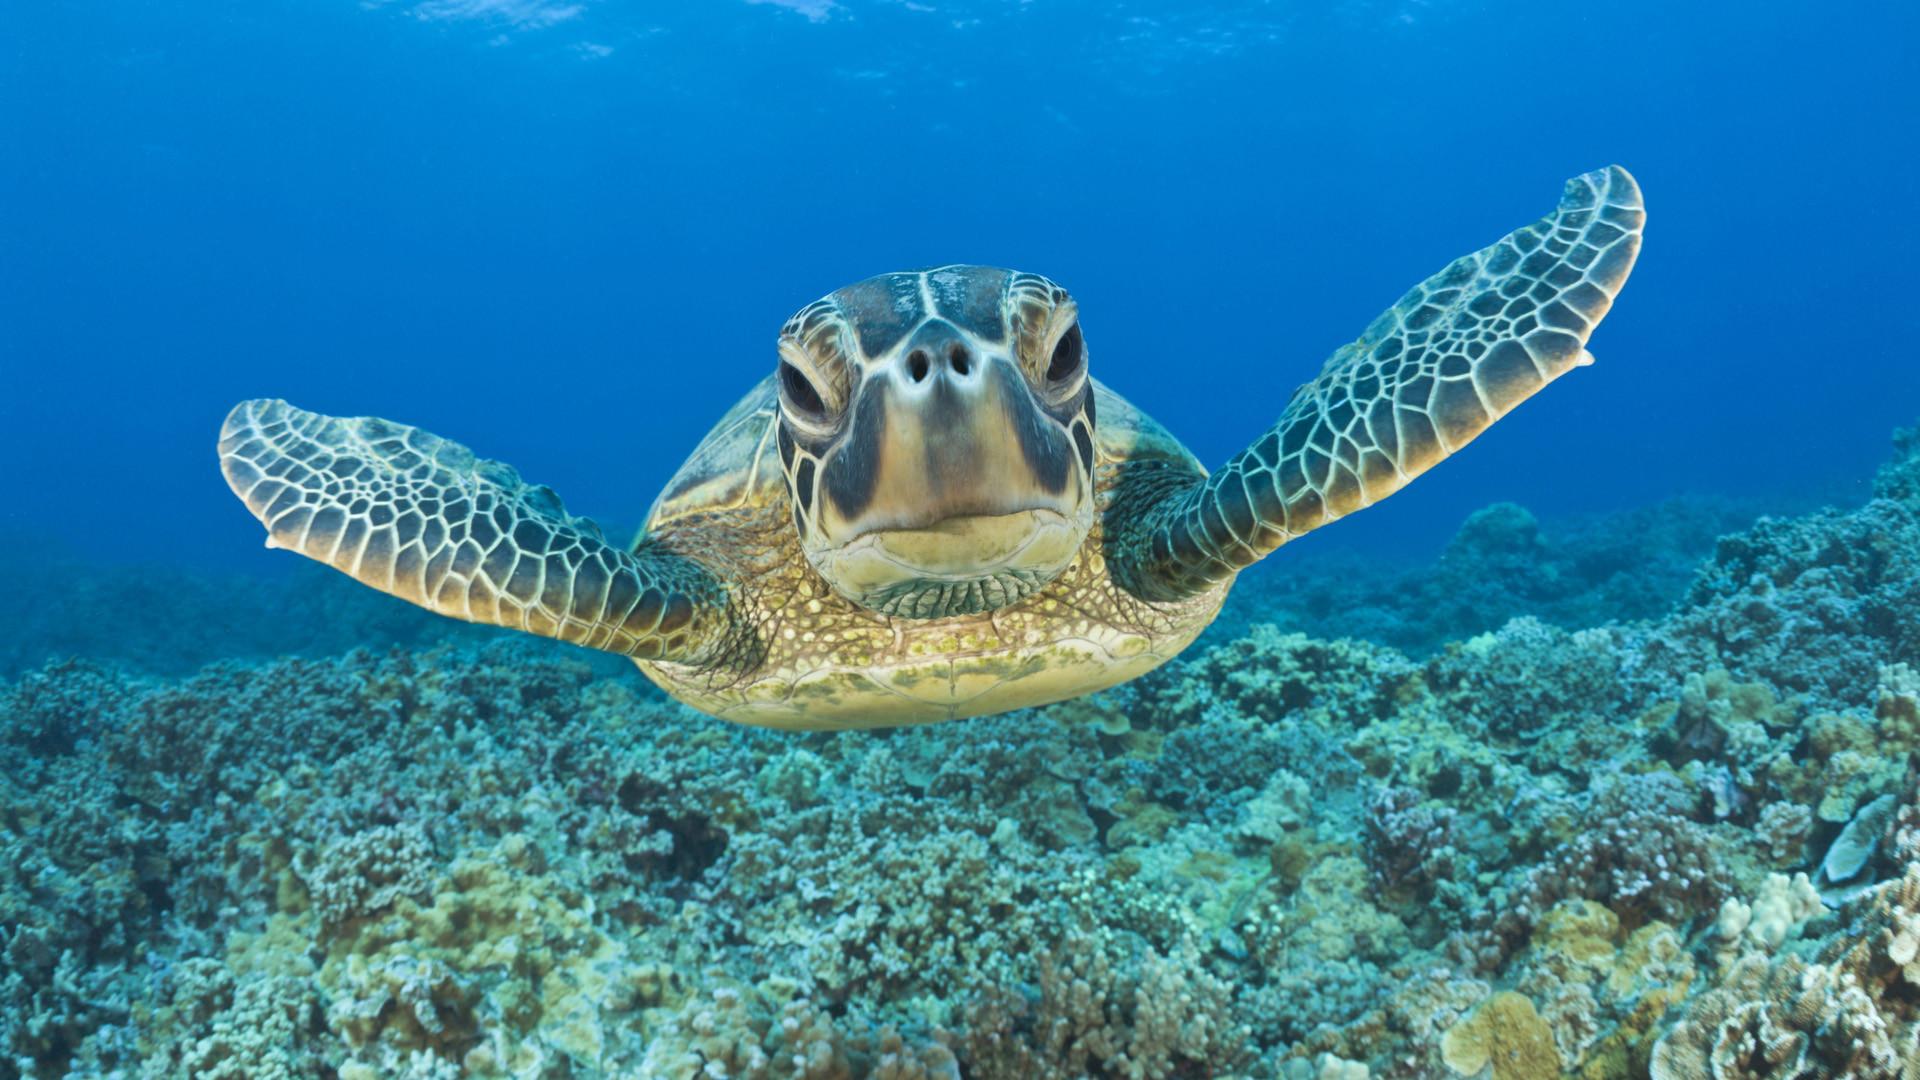 Bing Baby Turtle HD desktop wallpaper Widescreen High